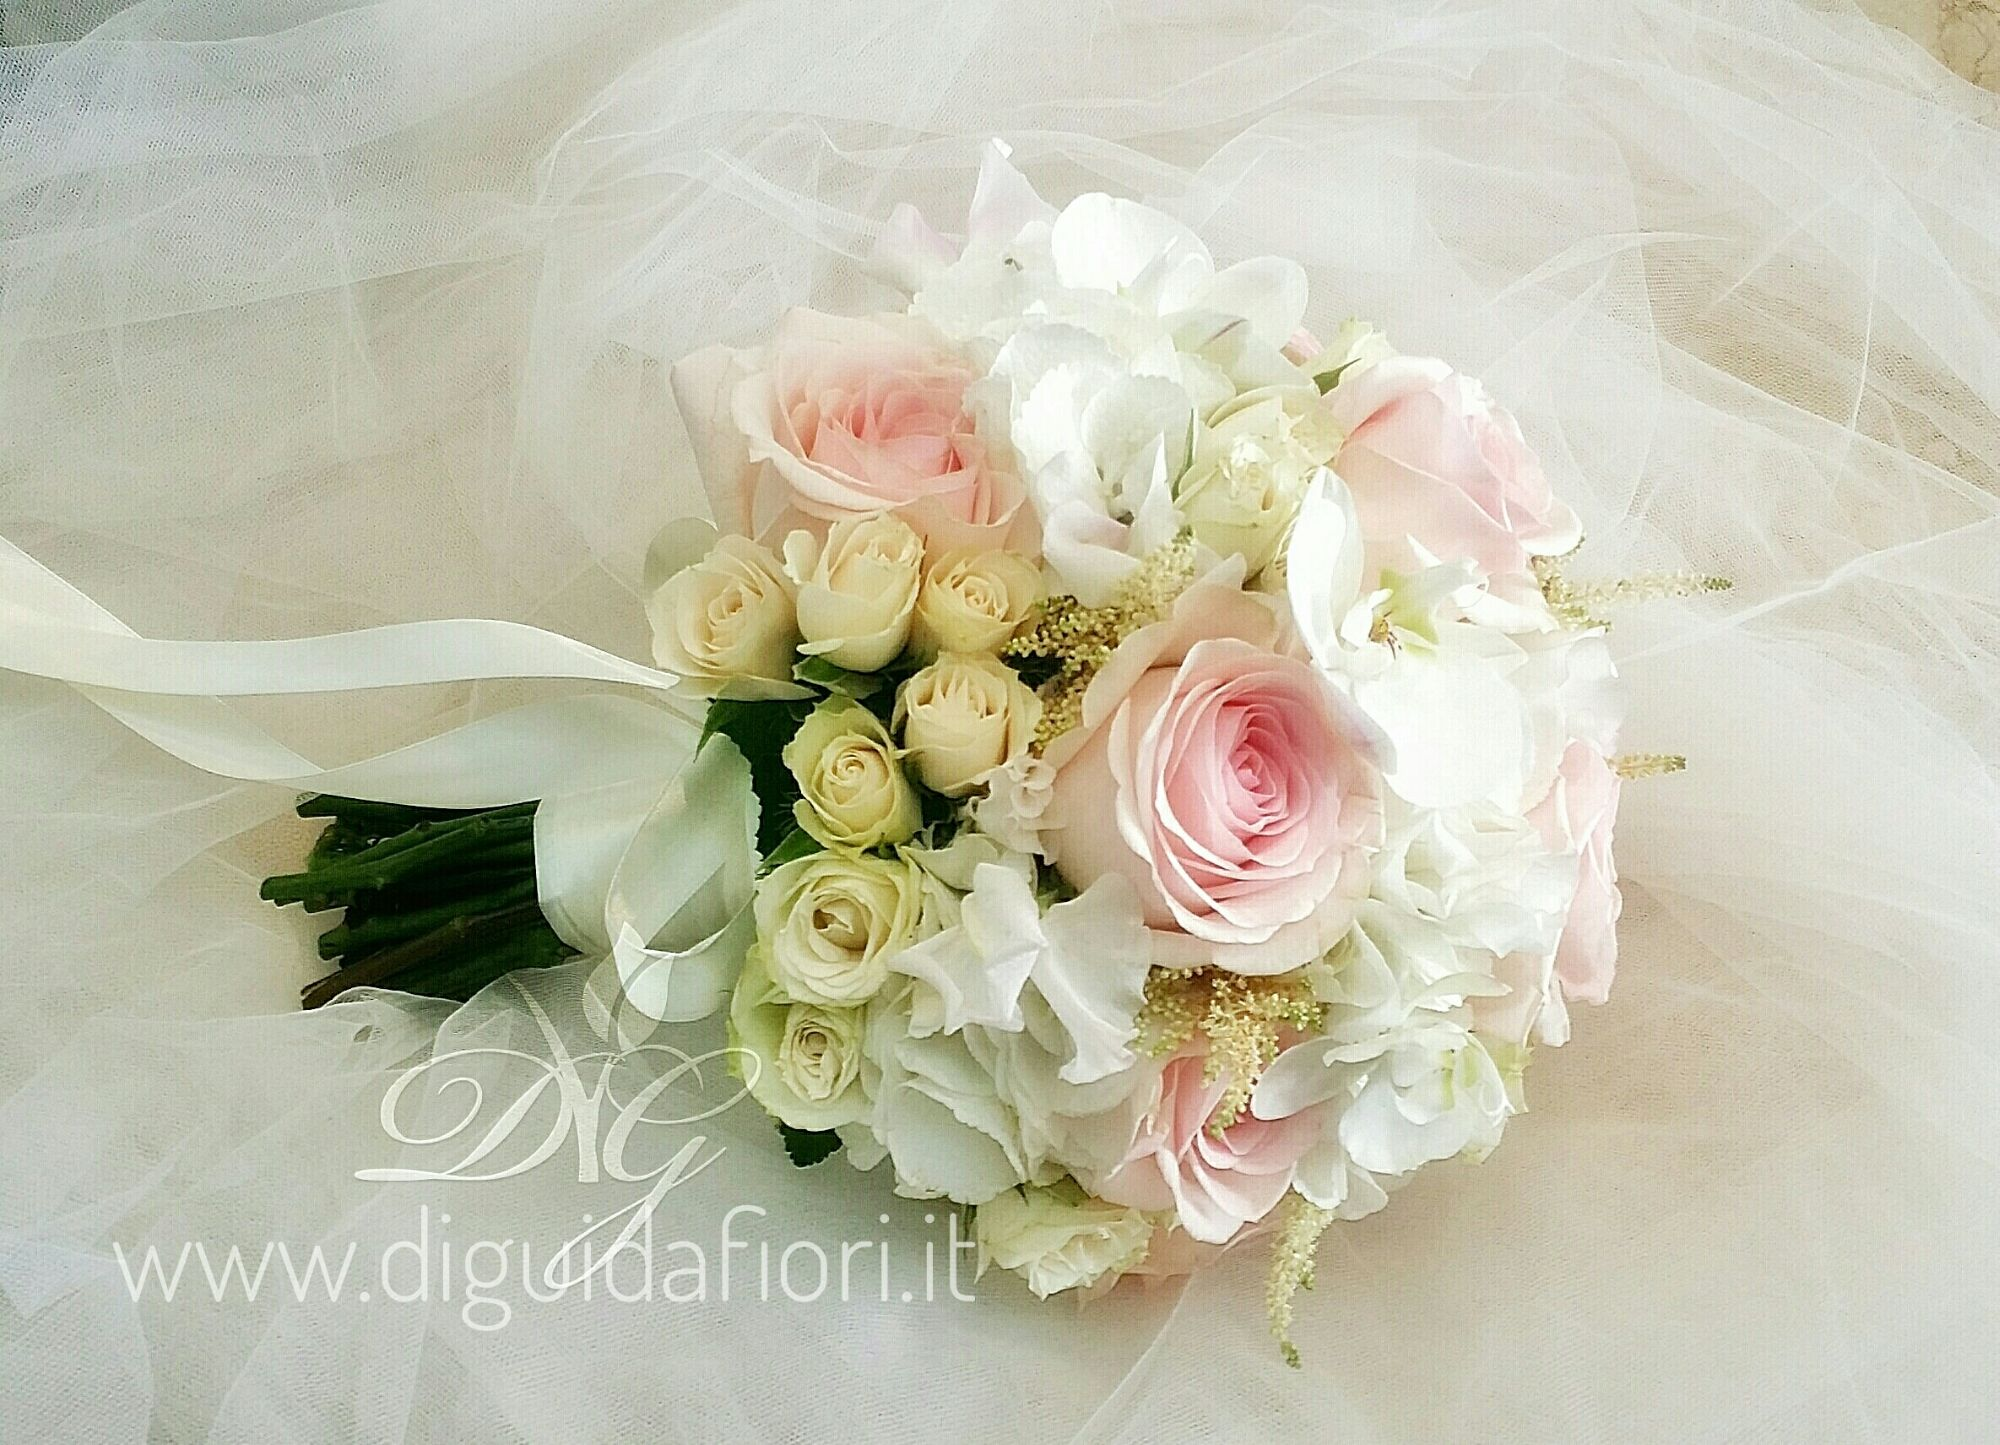 Bouquet Sposa Elegantissimo.Bouquet Da Sposa Elegante Bouquet Da Sposa Bouquet E Bouquet